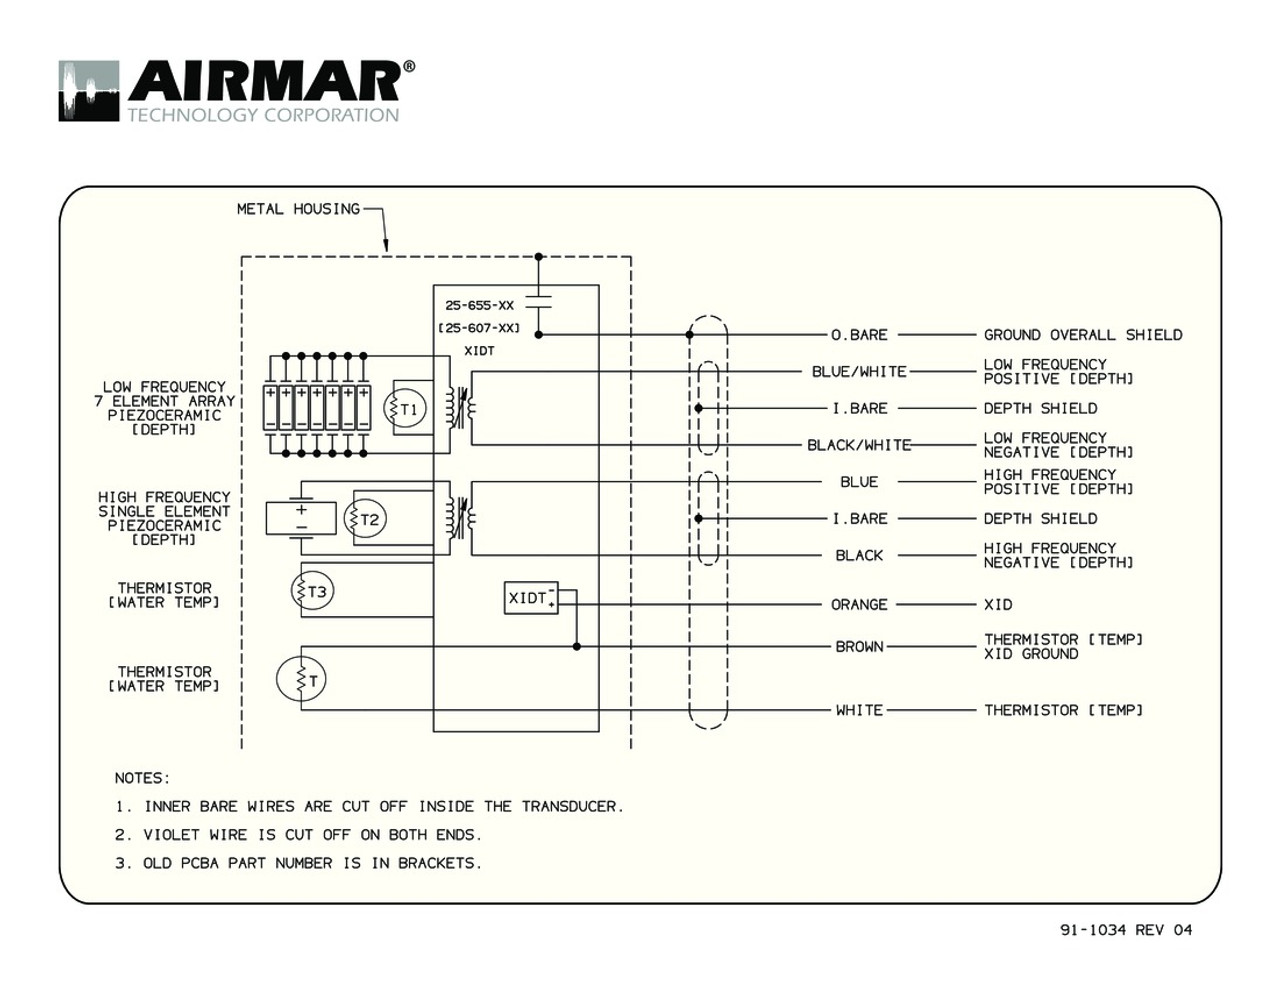 airmar wiring diagram b265 b275 blue bottle marineairmar wiring diagrams 8 [ 1280 x 989 Pixel ]